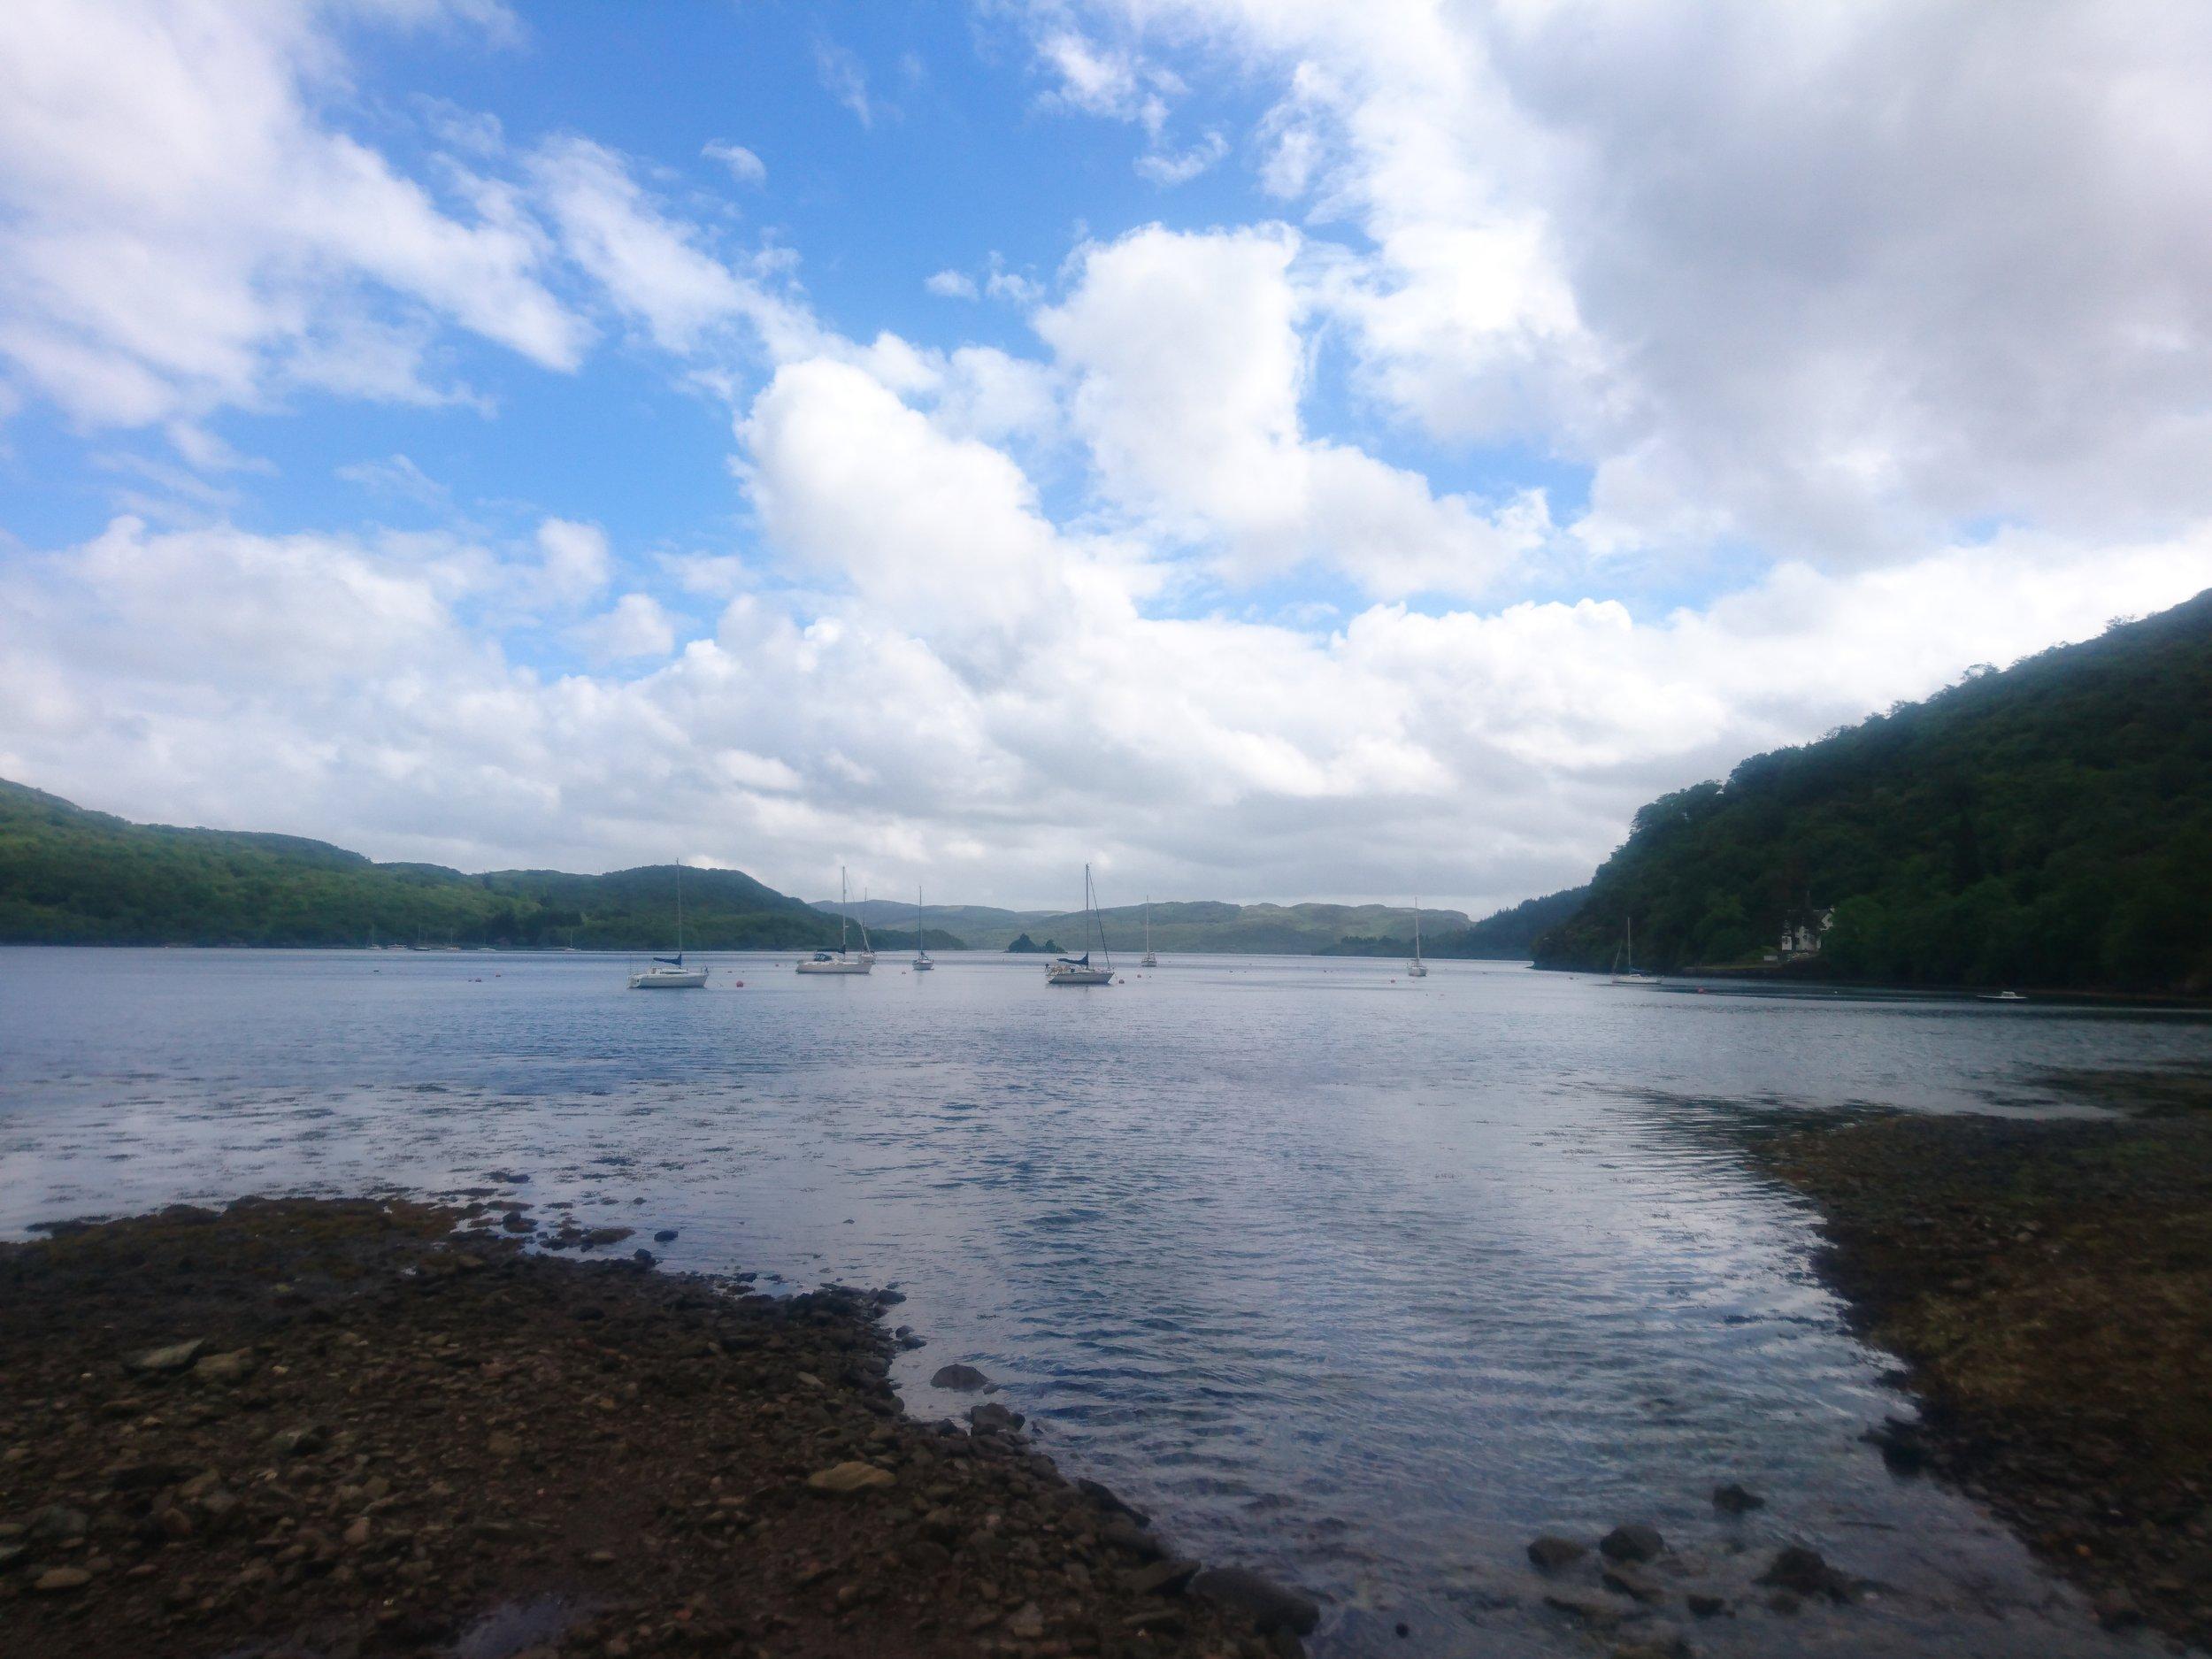 Yachts on Loch